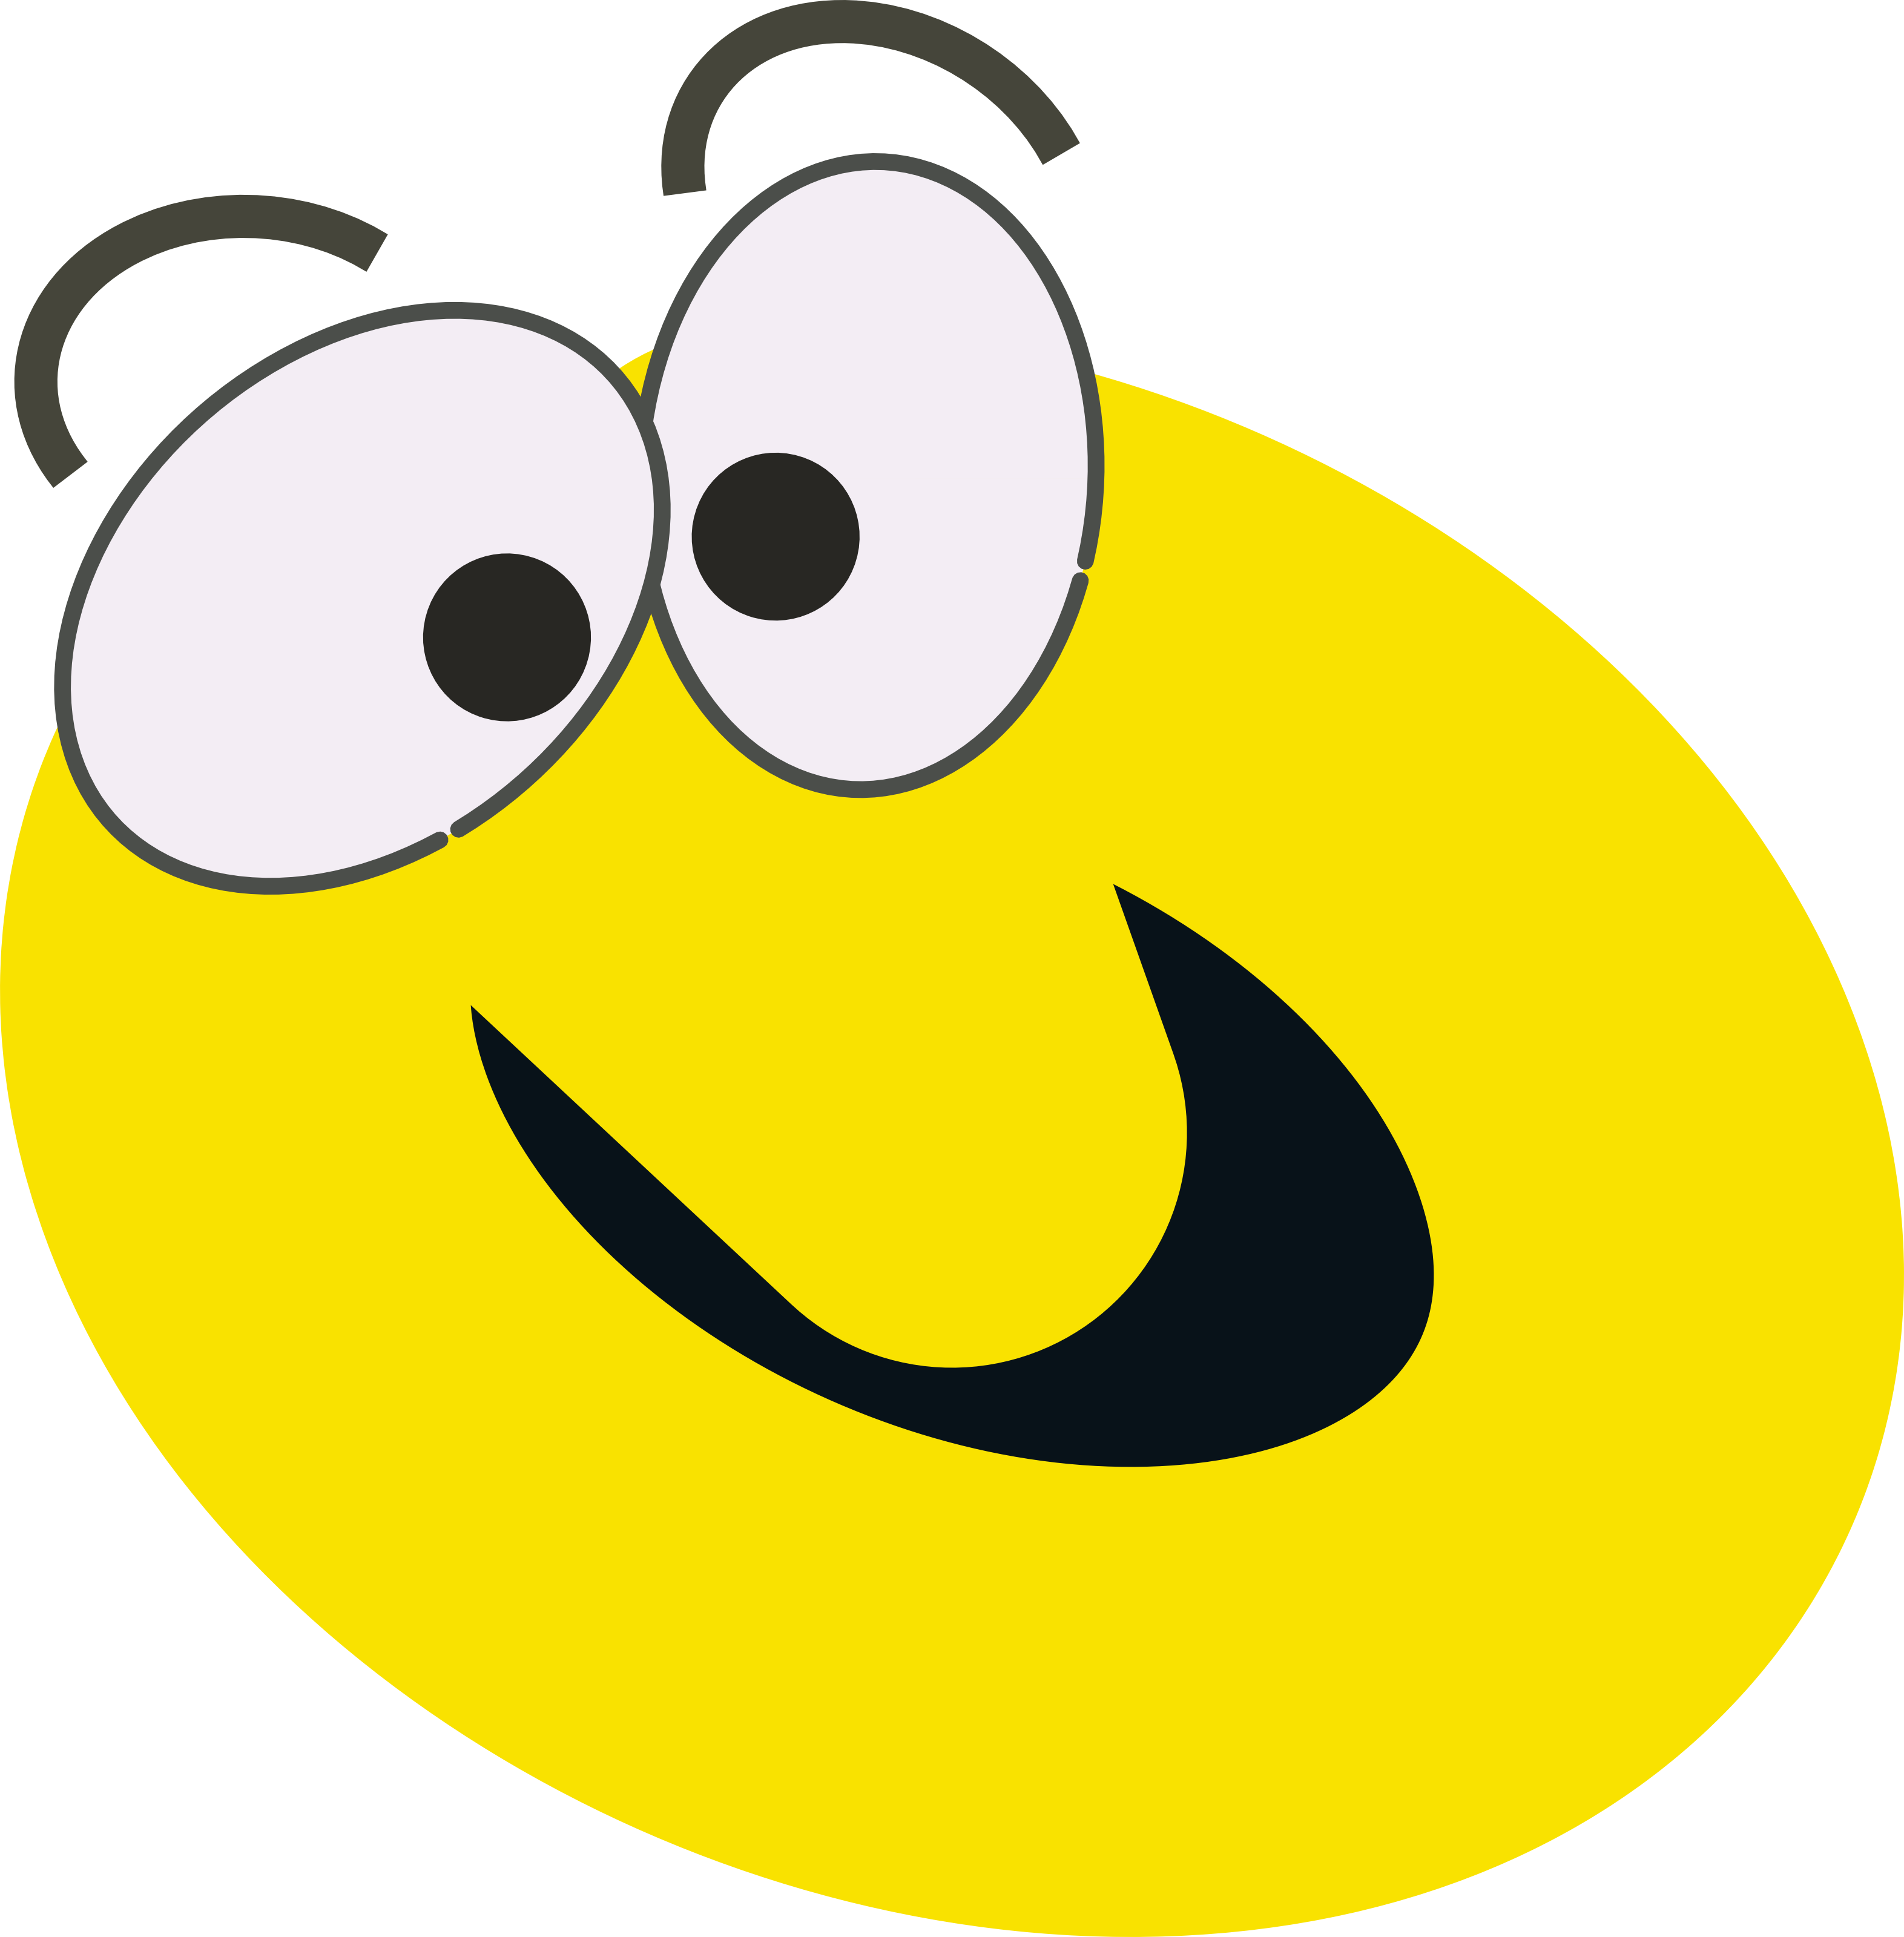 Free Cartoon Face Clipart .-Free Cartoon Face Clipart .-3